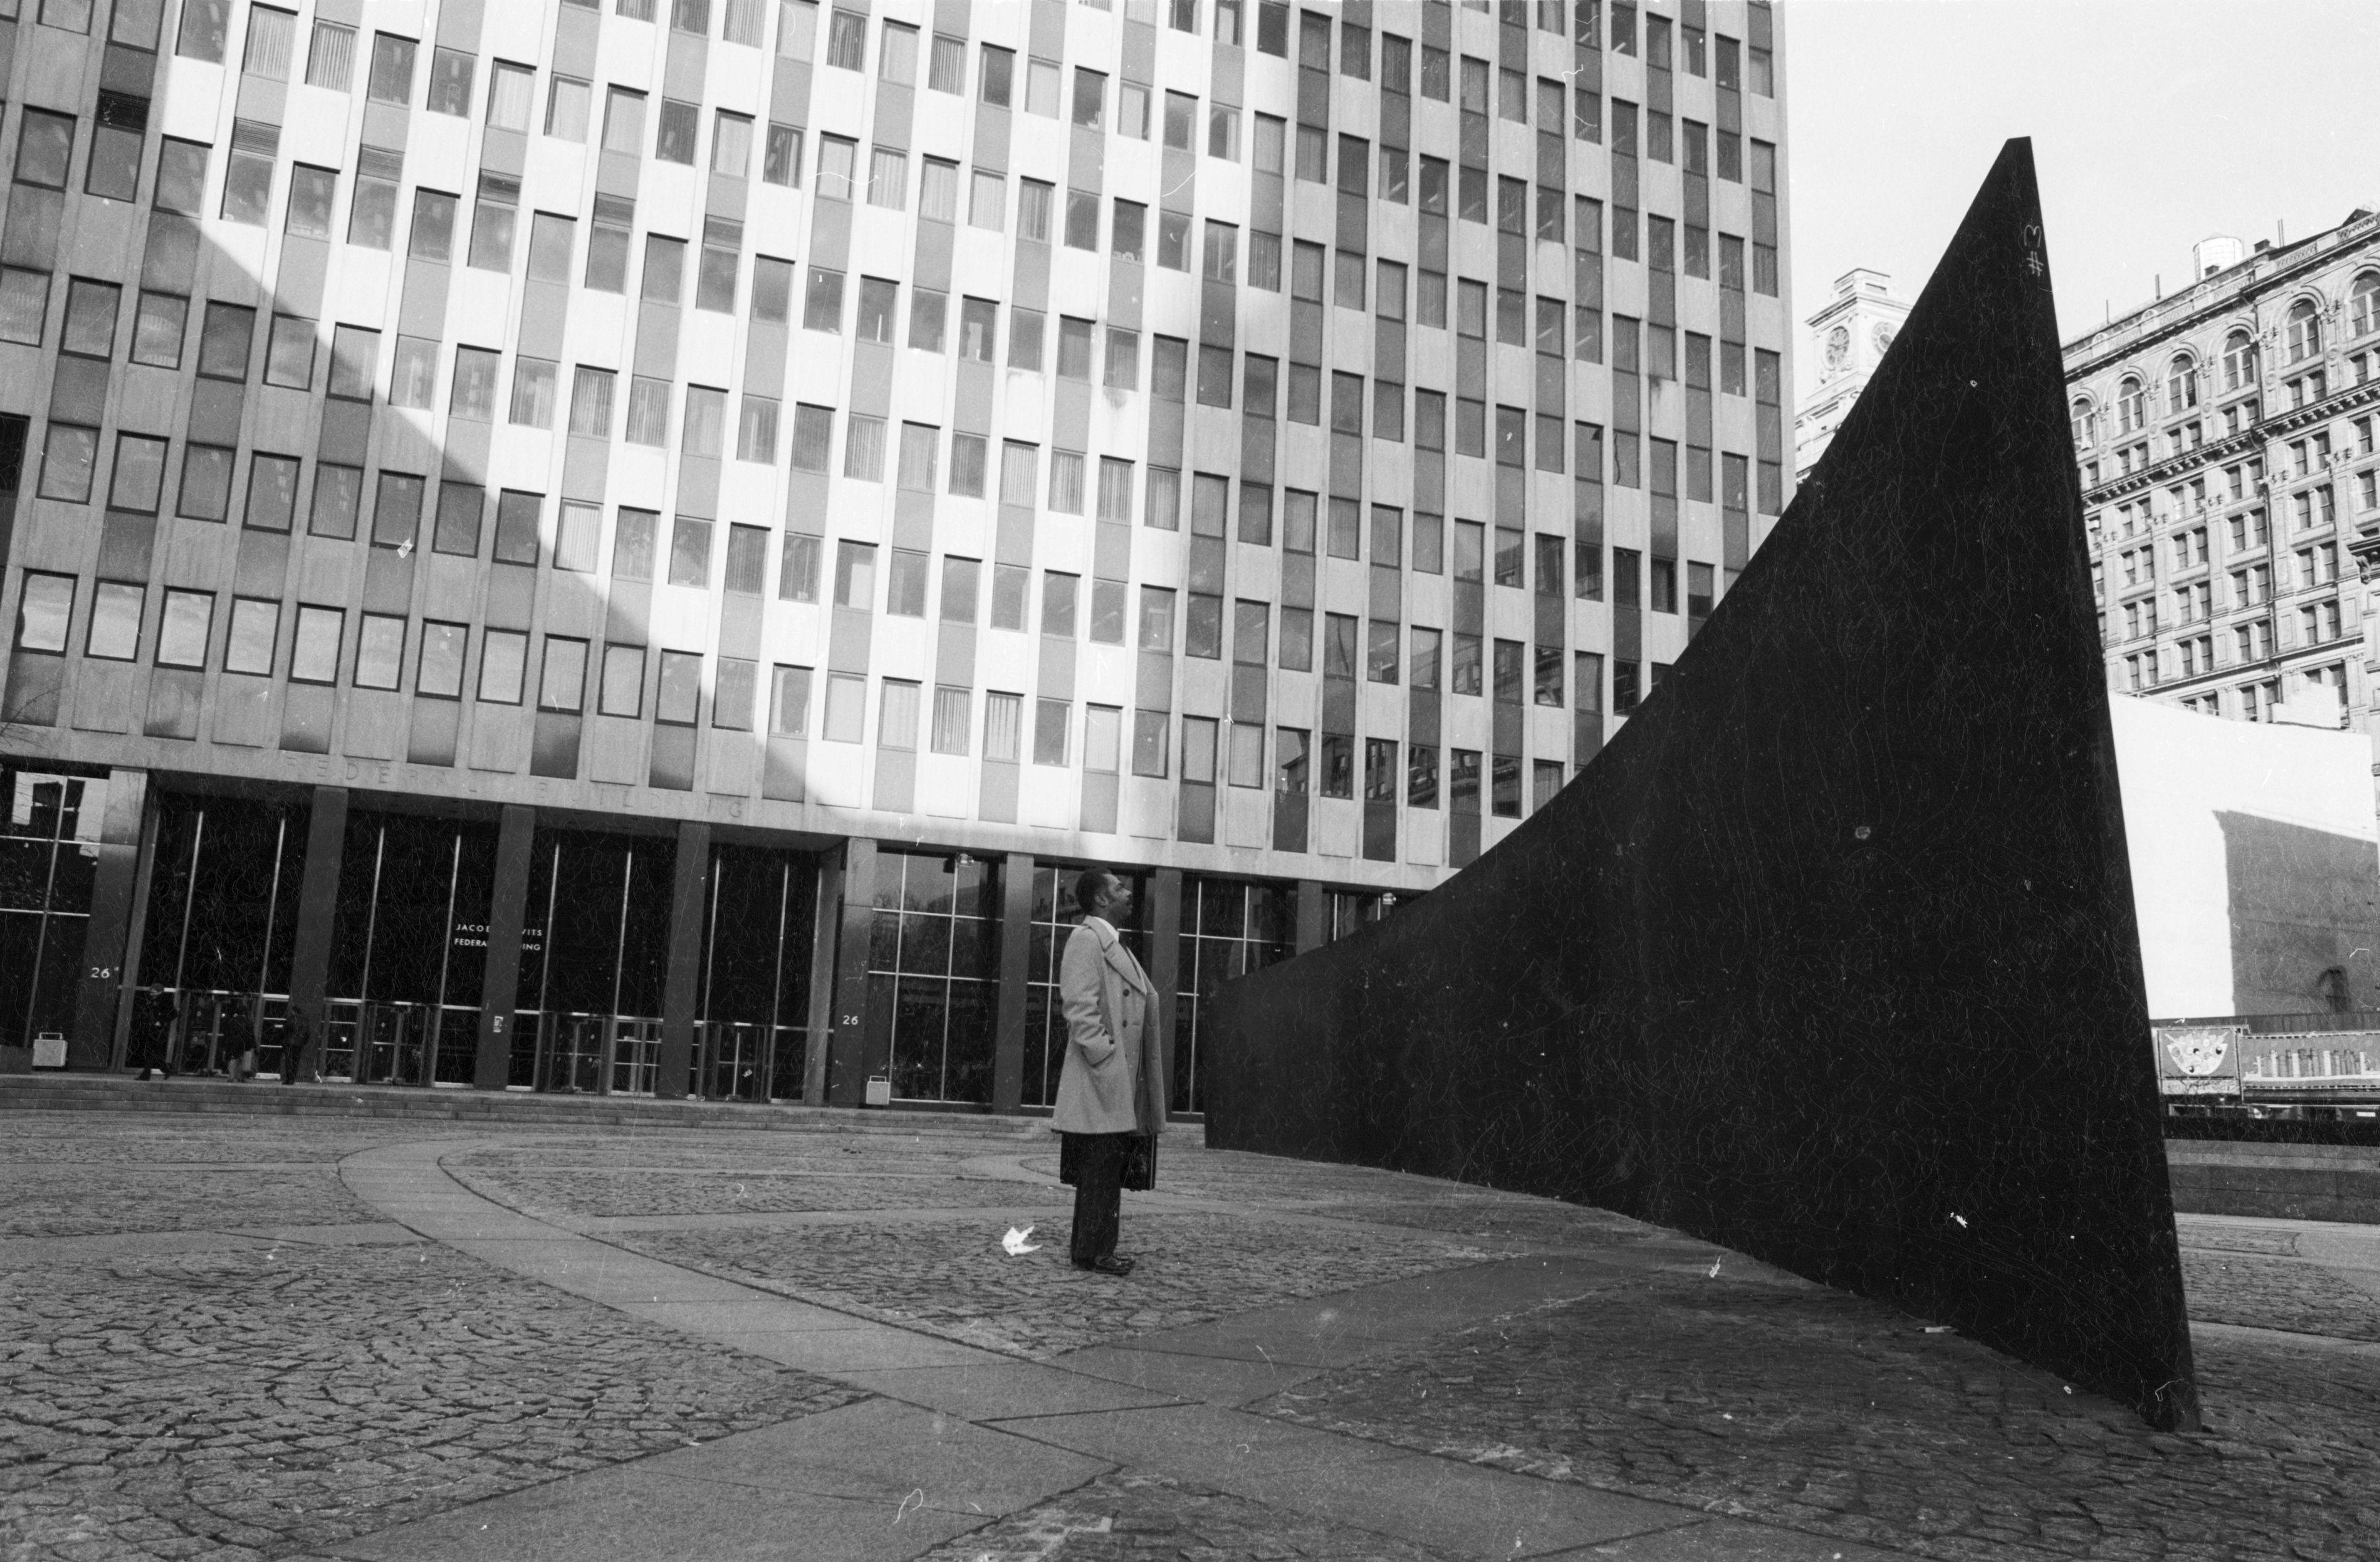 Public Art 1.0 | Richard serra, Public art and Contemporary art